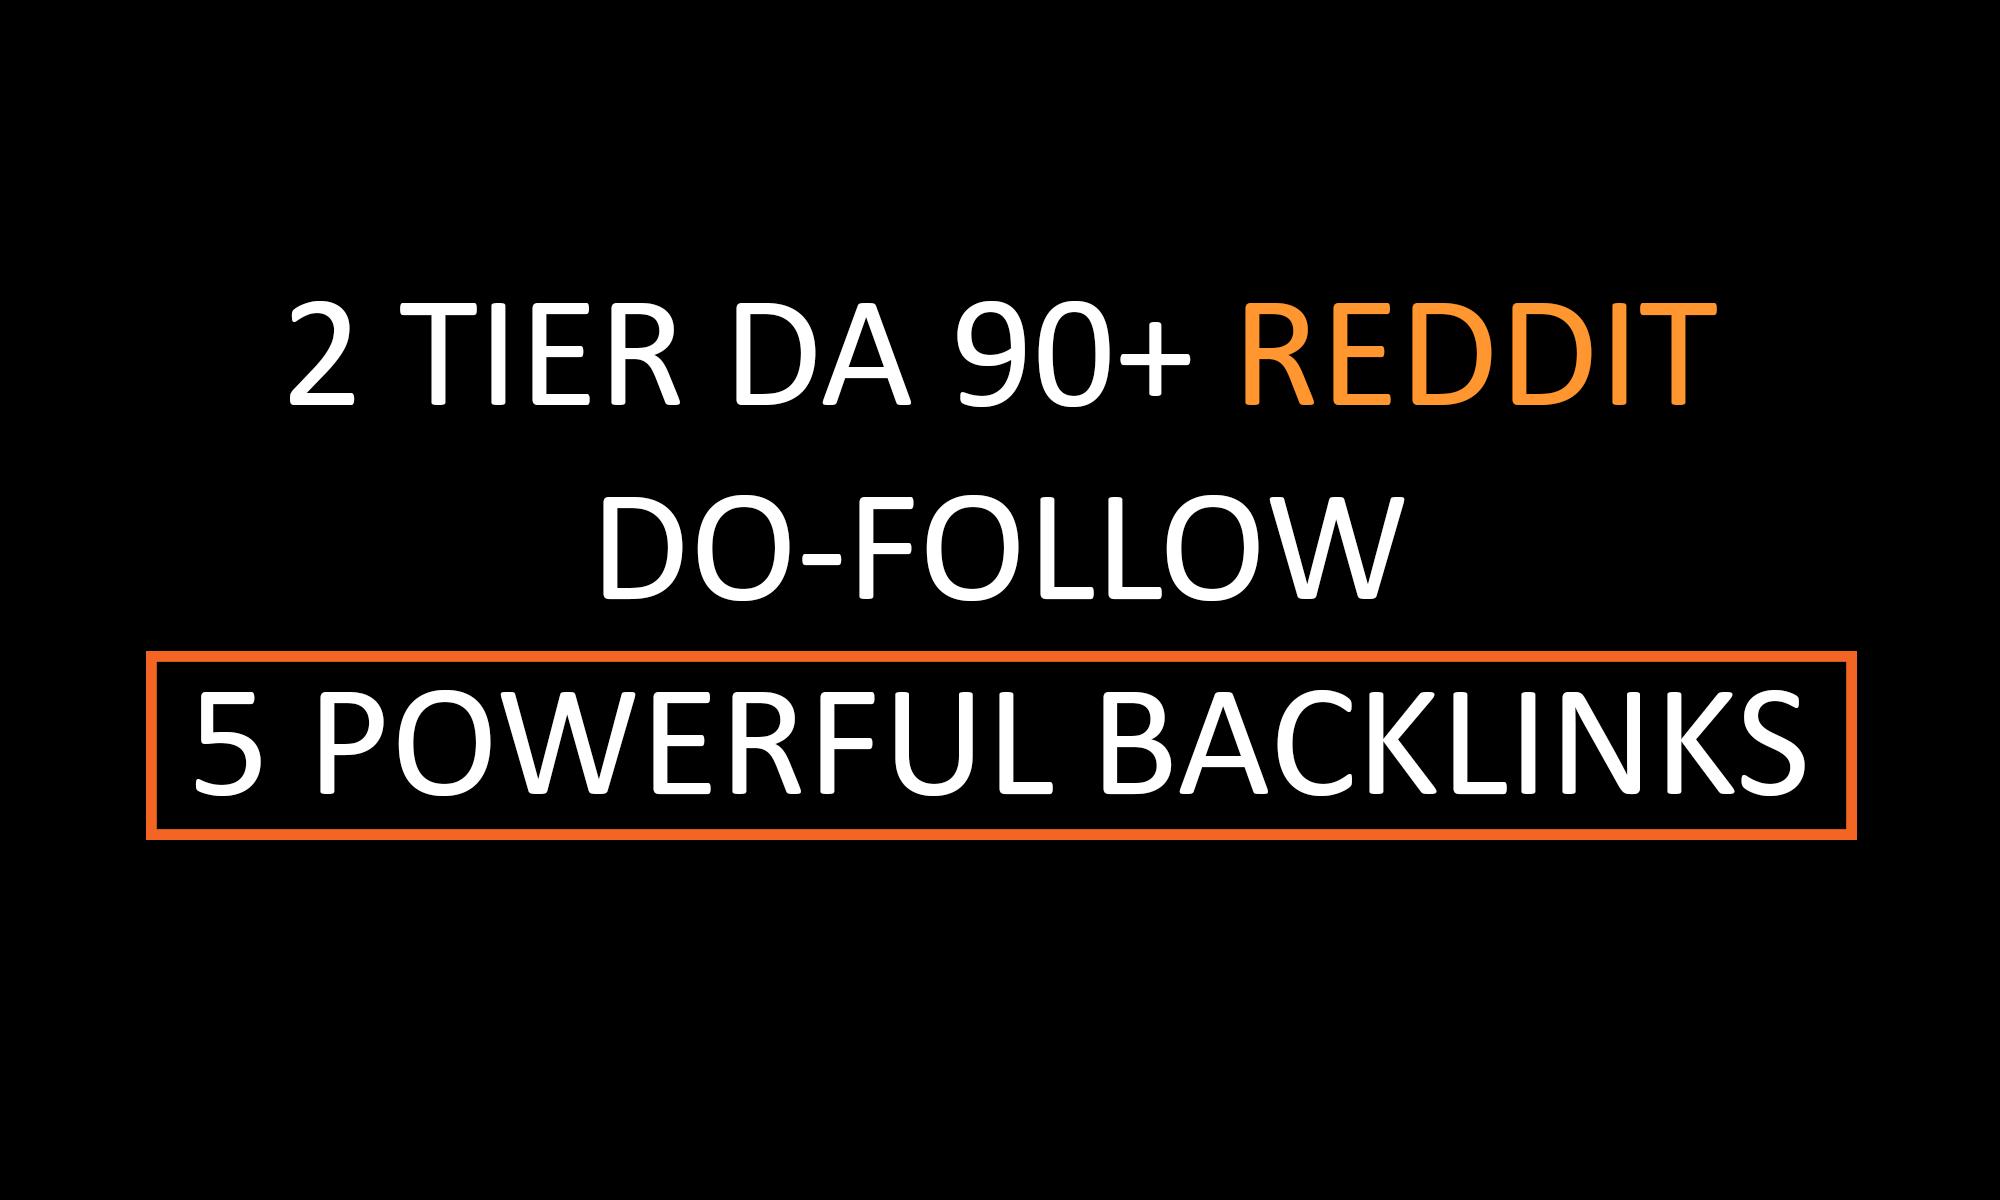 Build 5 DA 90+ Dofollow Powerful 2 TIER Reddit SEO BACKLINKS